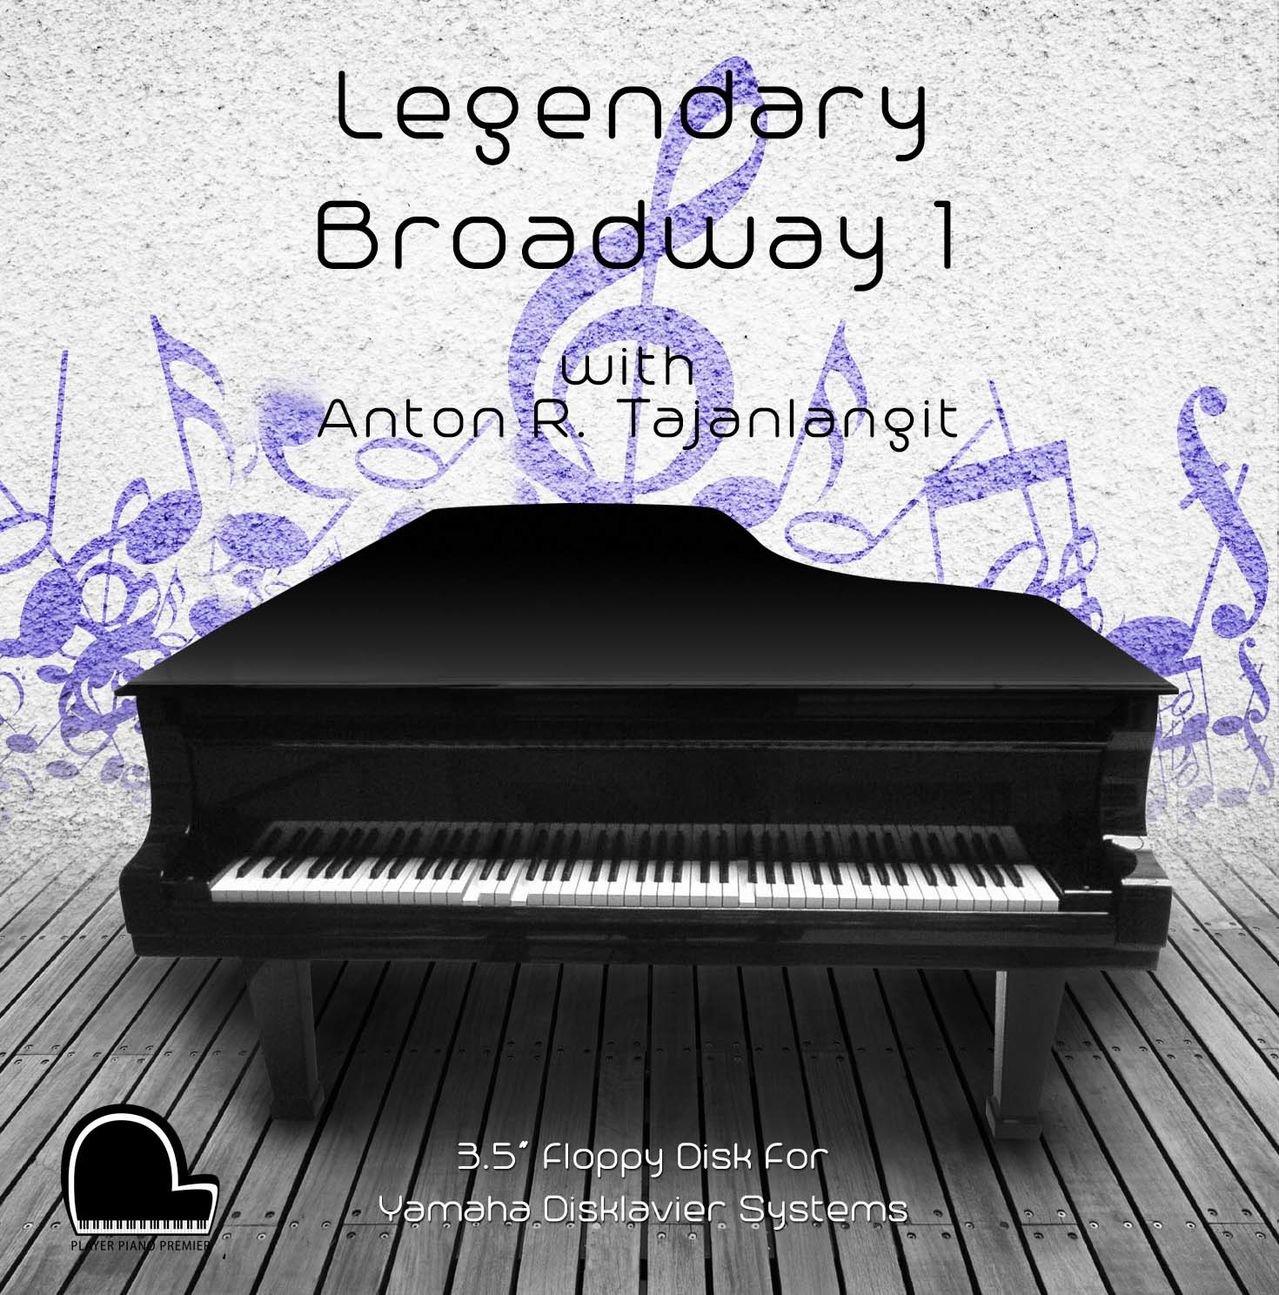 Legendary Broadway 1 - Yamaha Disklavier Compatible Player Piano Music on 3.5'' DD 720k Floppy Disk